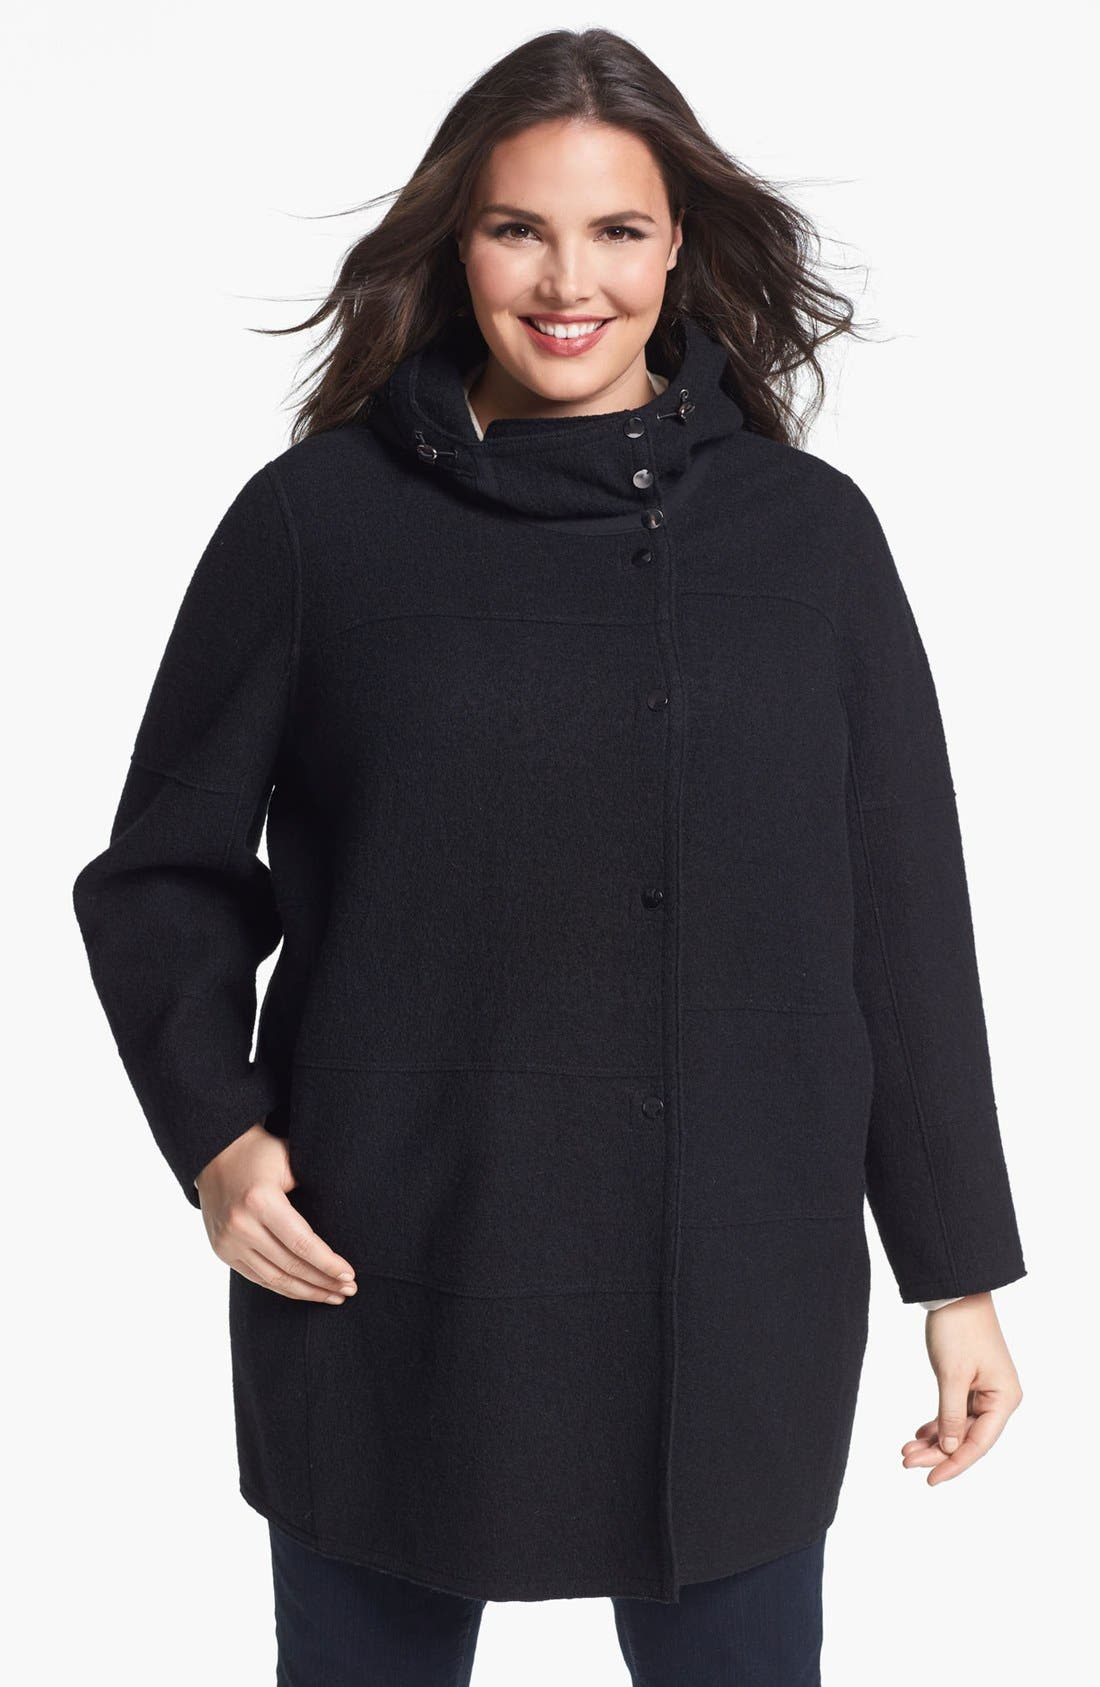 Alternate Image 1 Selected - Kristen Blake Hooded Boiled Wool Topper (Plus Size) (Online Only)